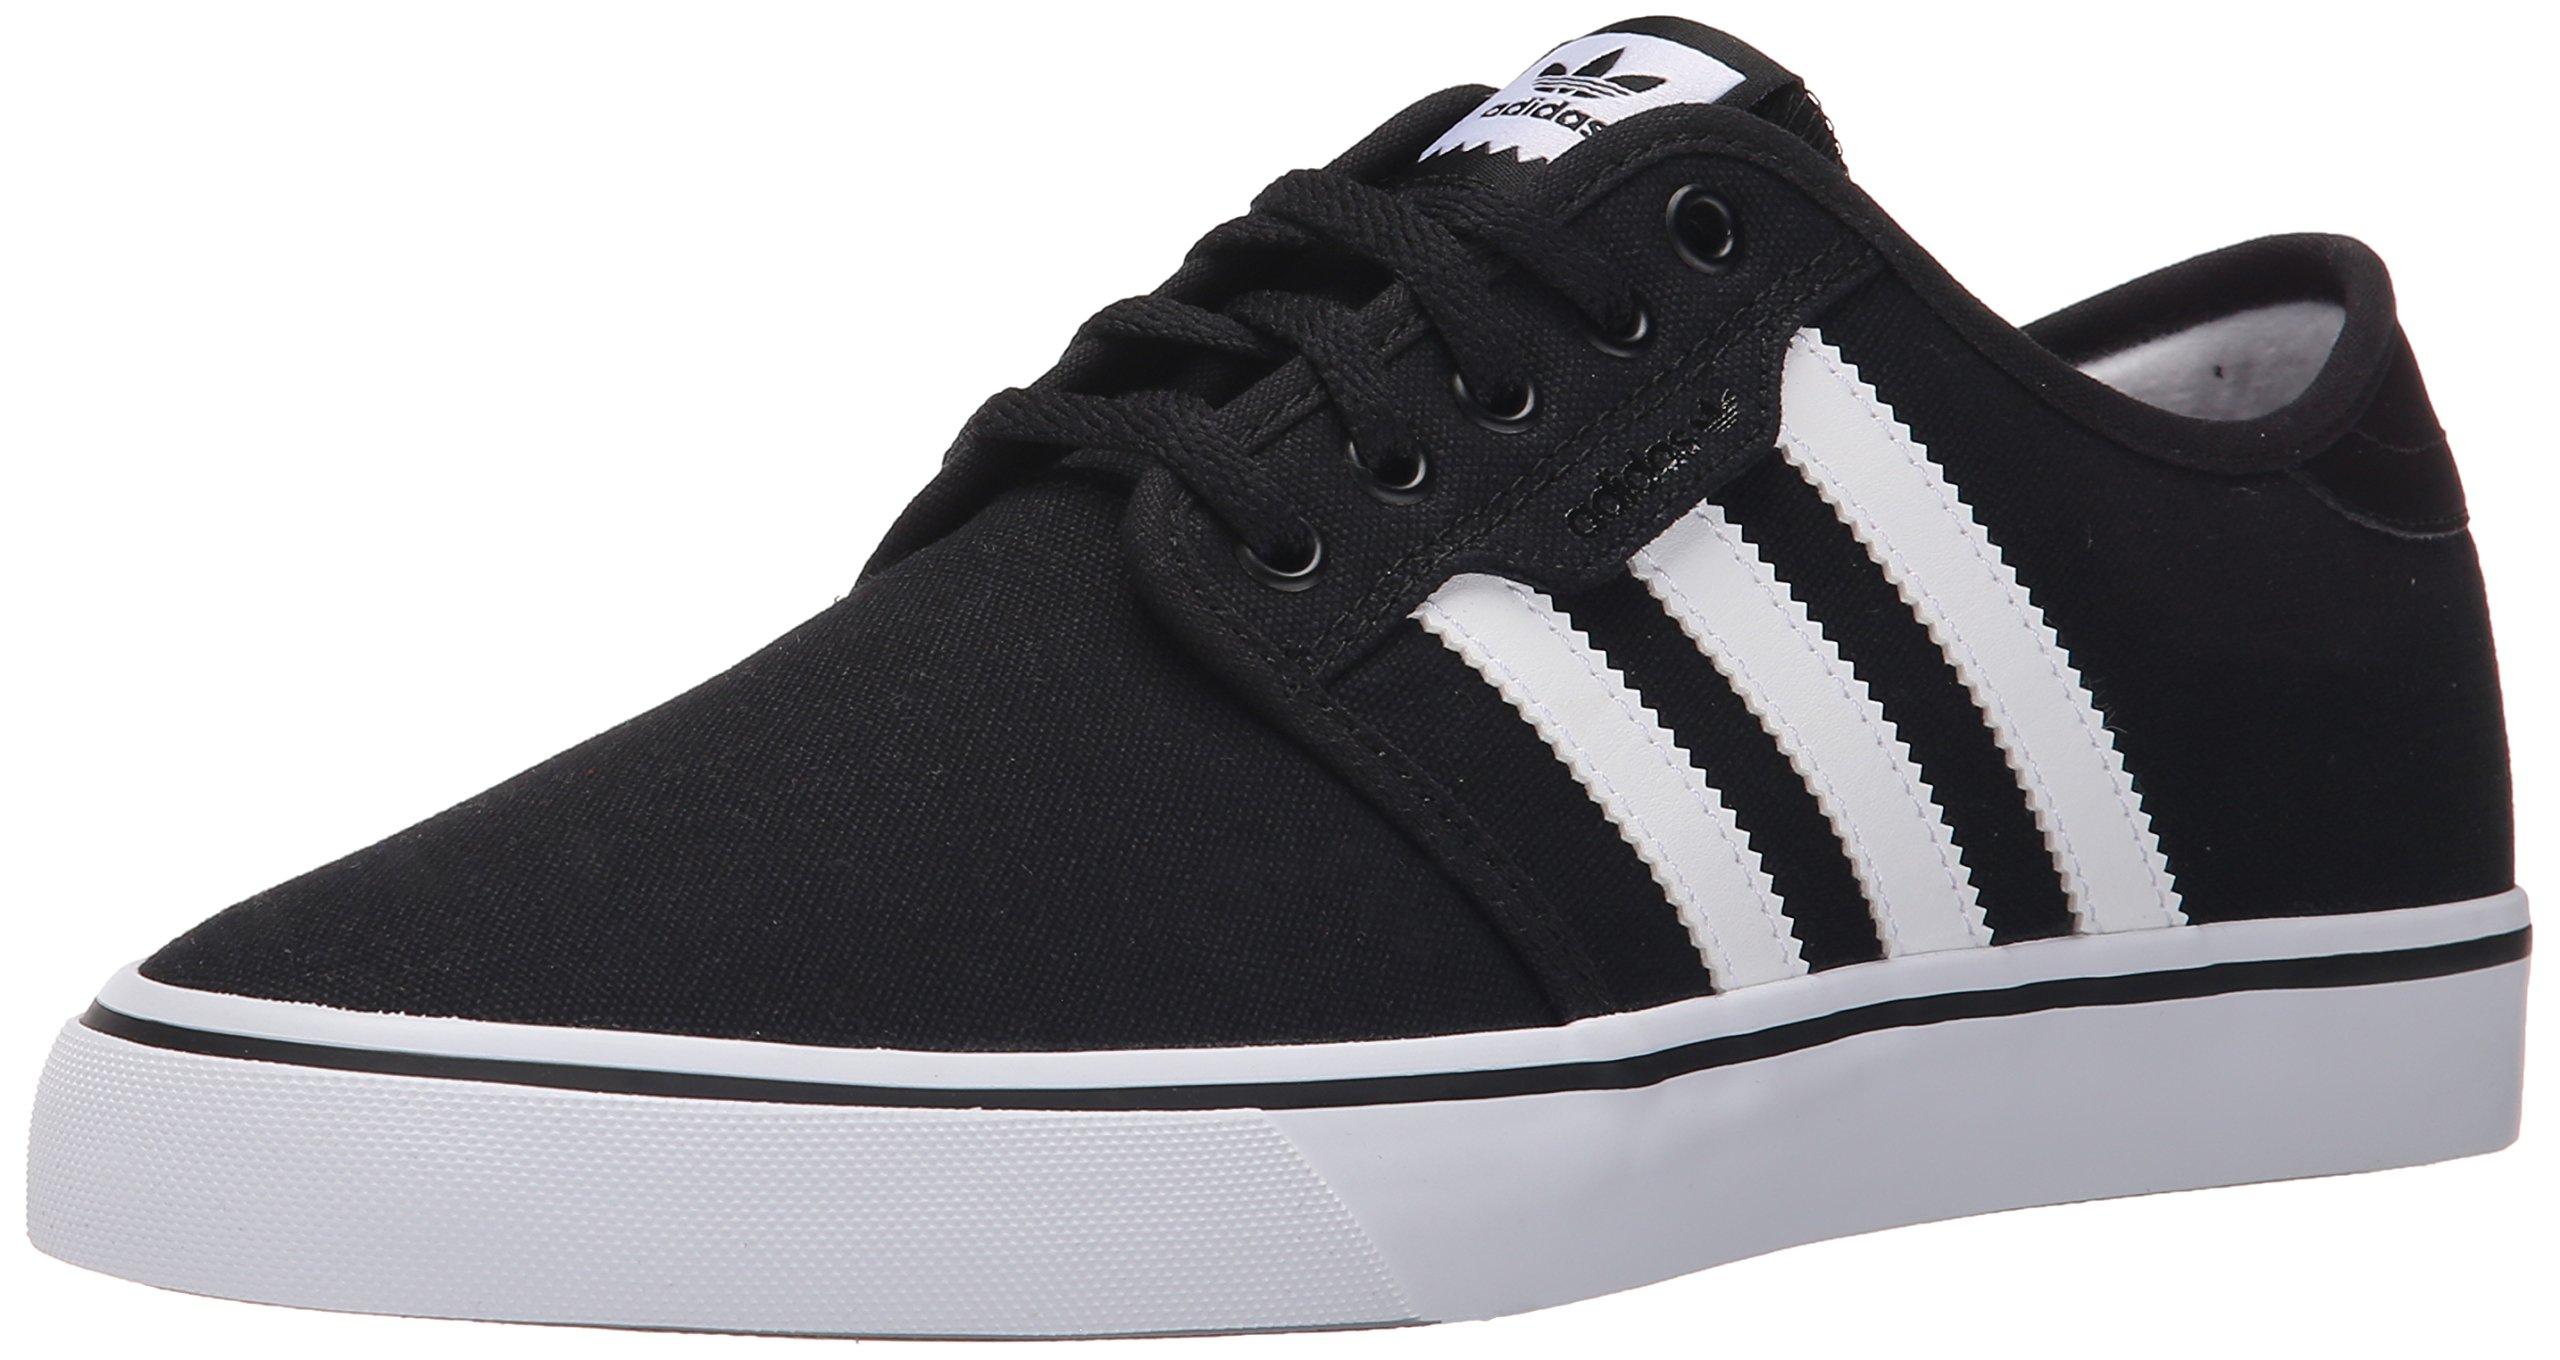 adidas Originals Men's Seeley Skate Shoe,Black/White/Gum,10 M US